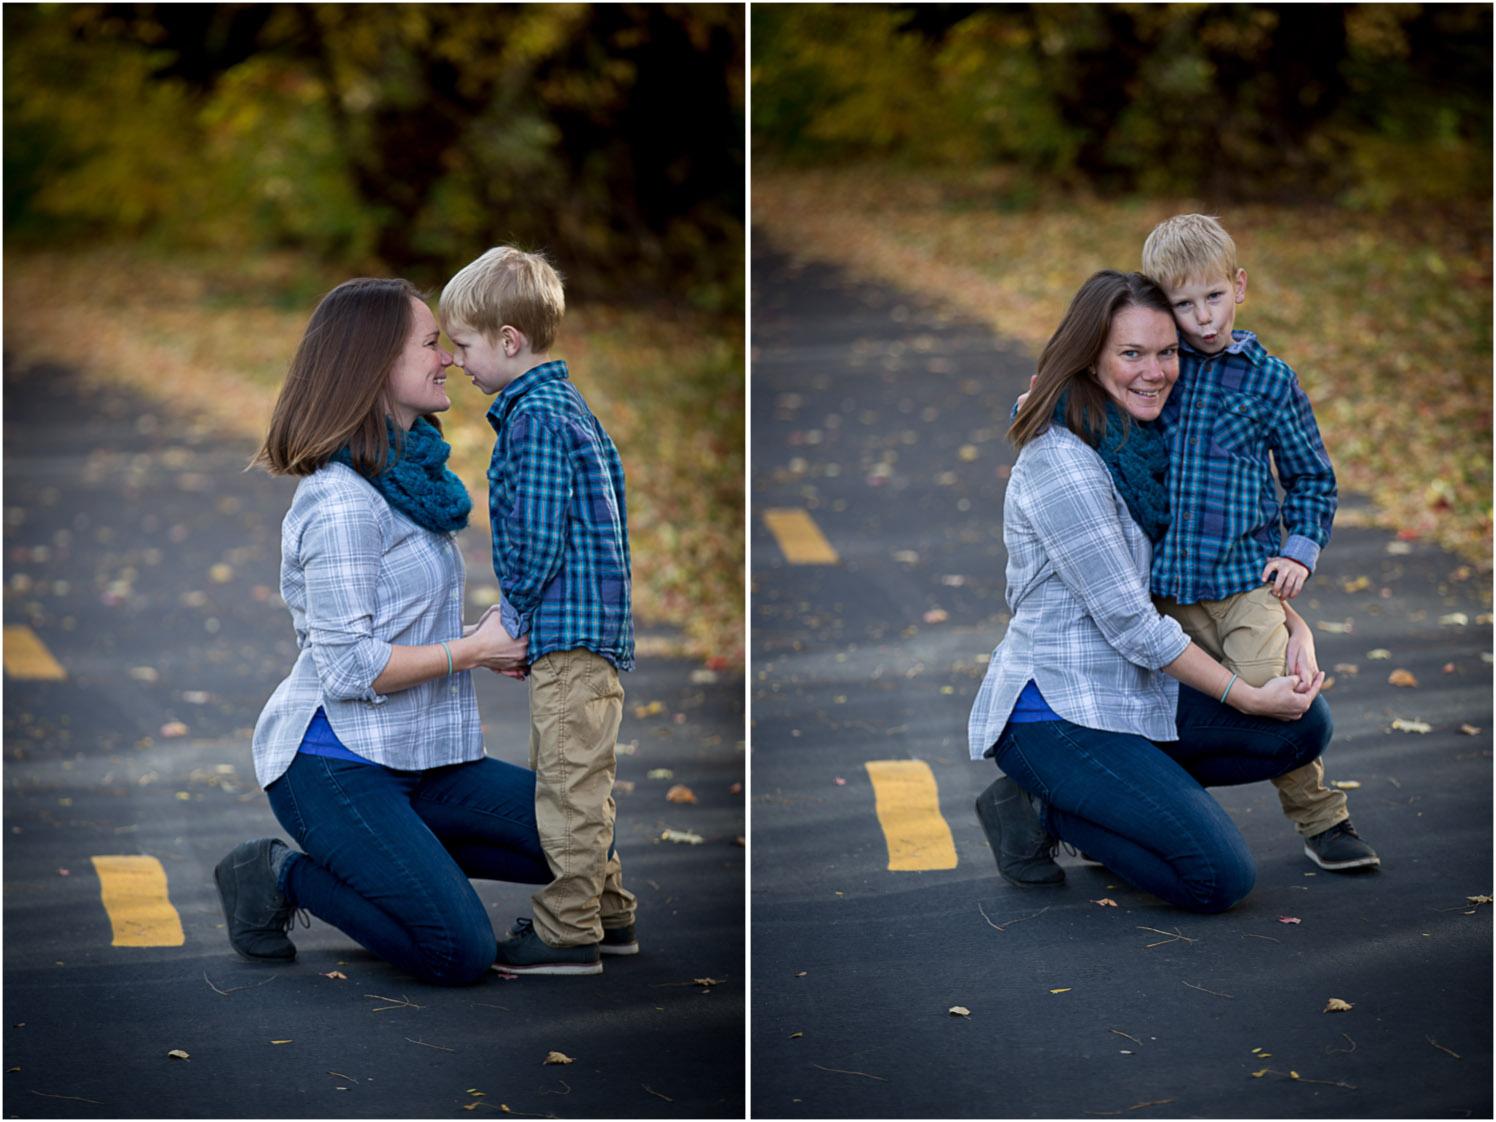 03-minnesota-fall-colors-mother-son-family-photo-session-mahonen-photography.jpg